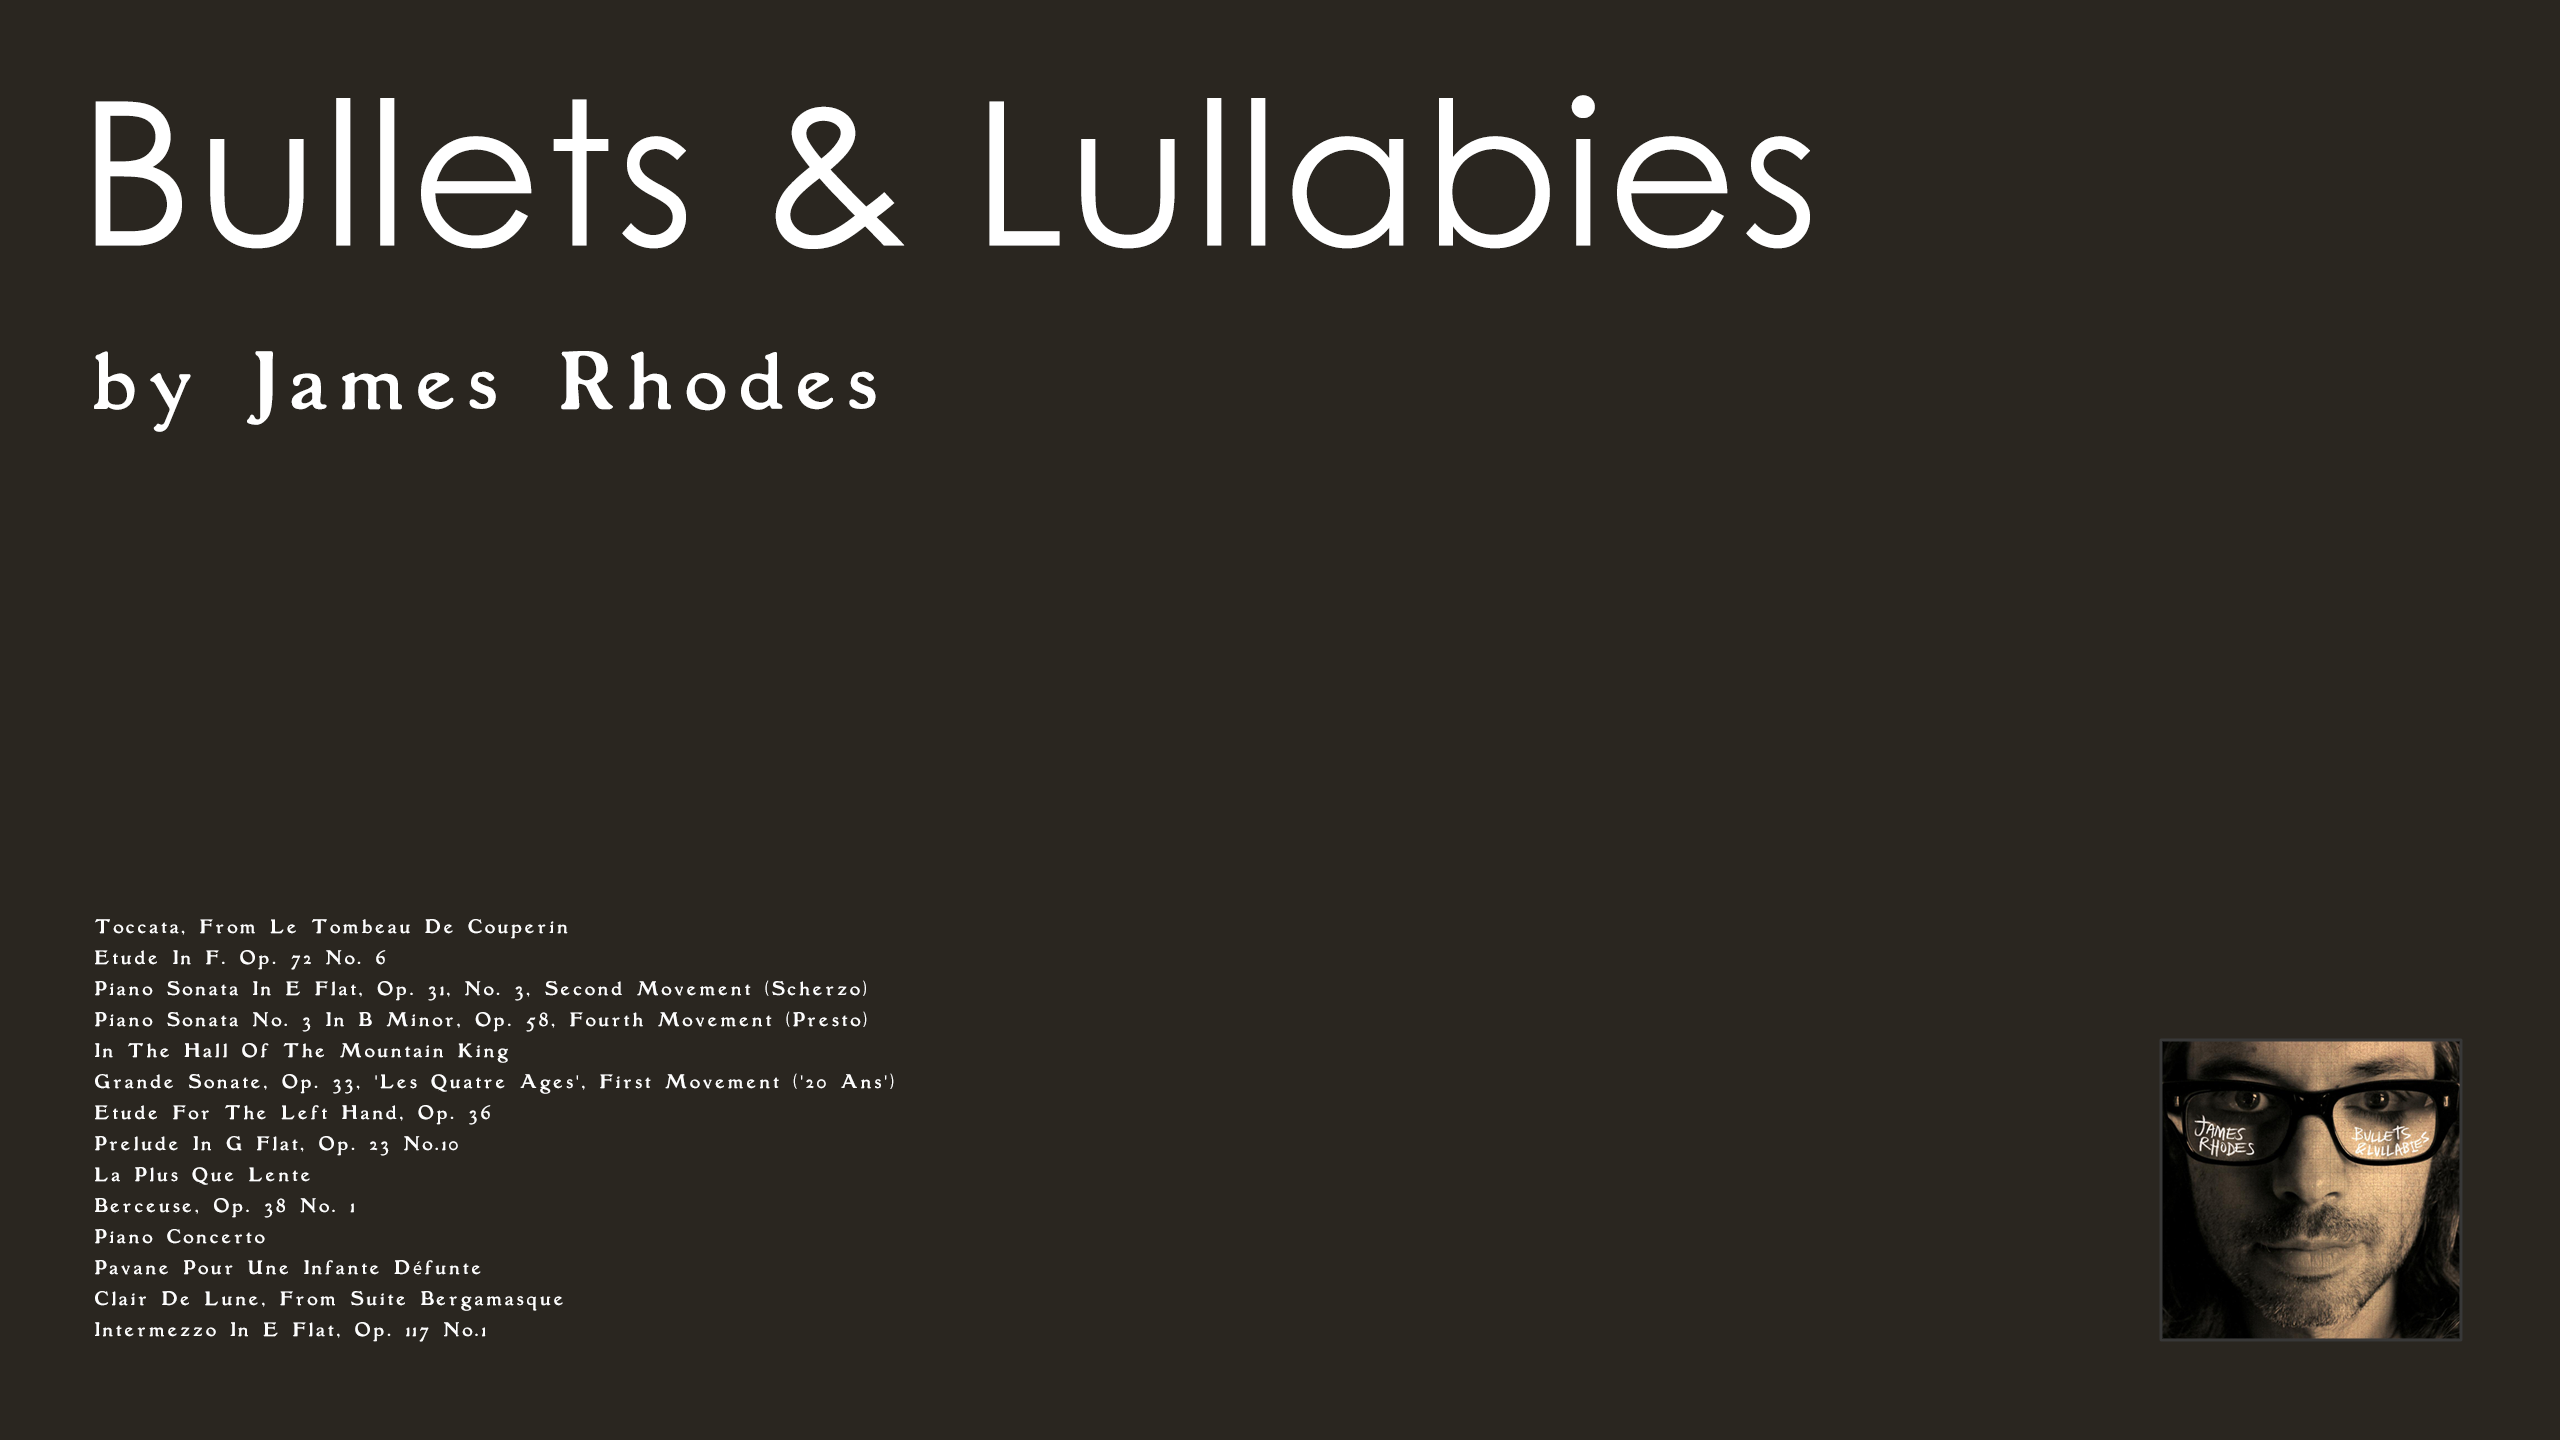 James Rhodes - Bullets & Lullabies